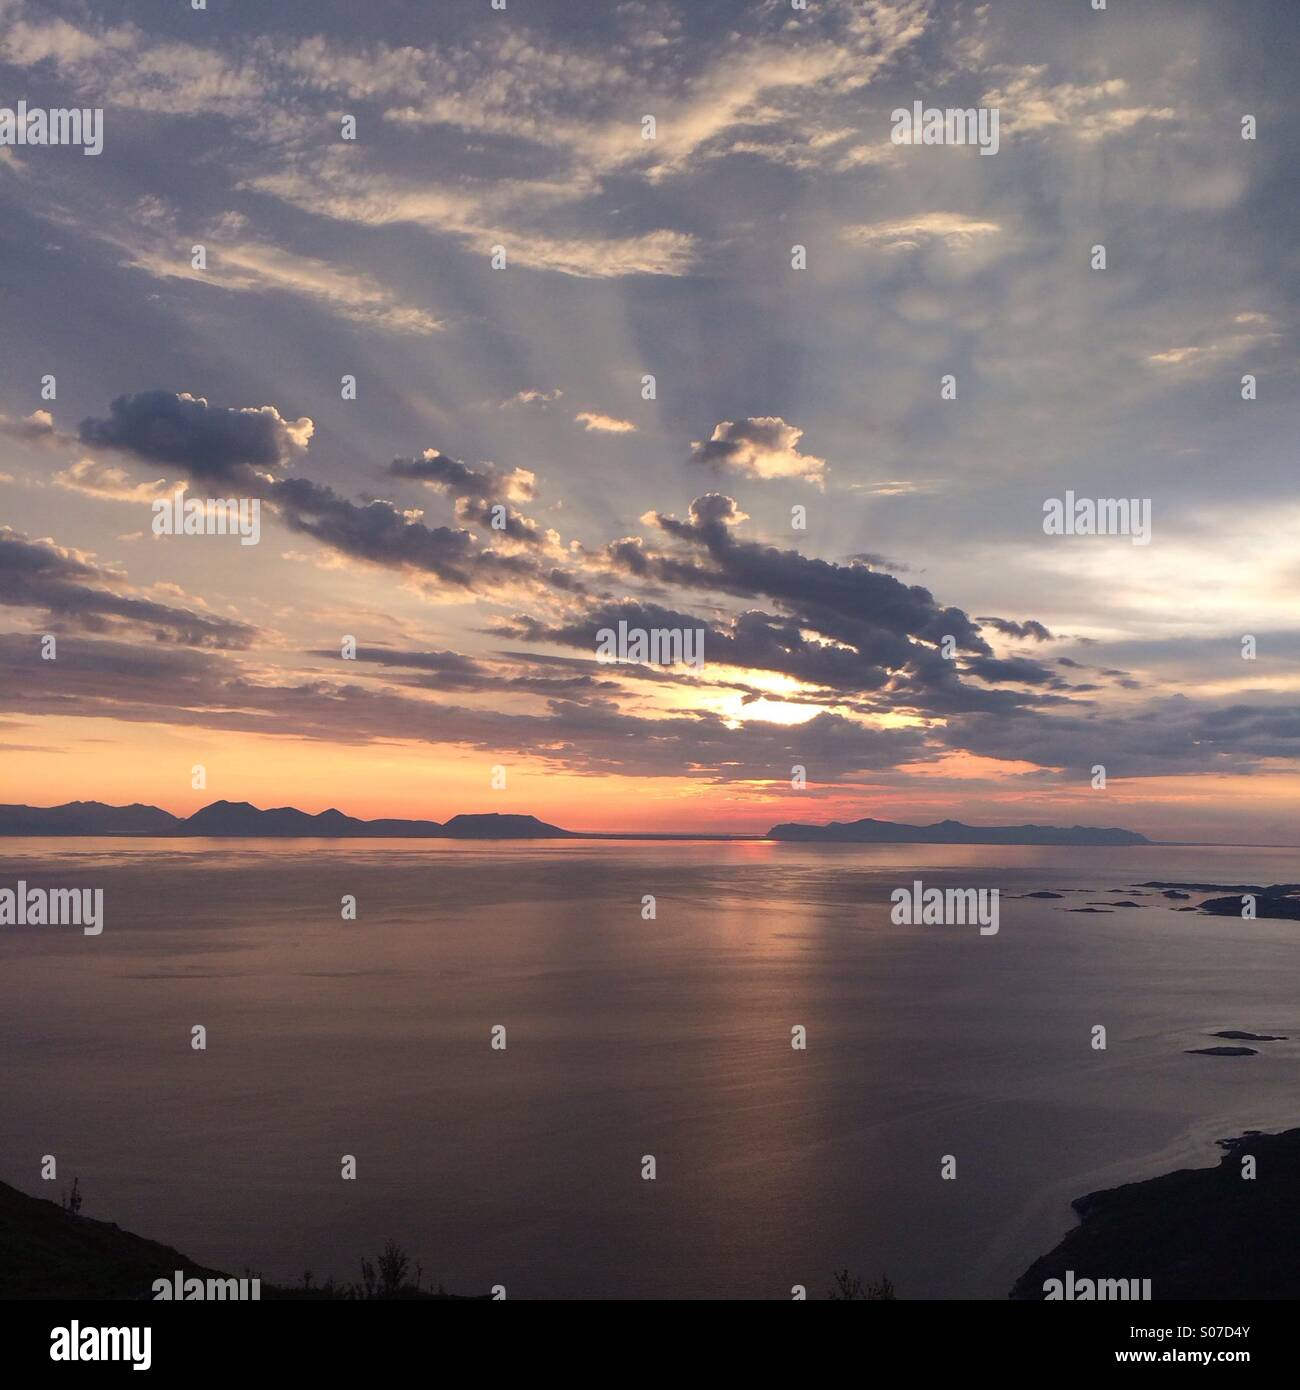 Midnightsun - Stock Image